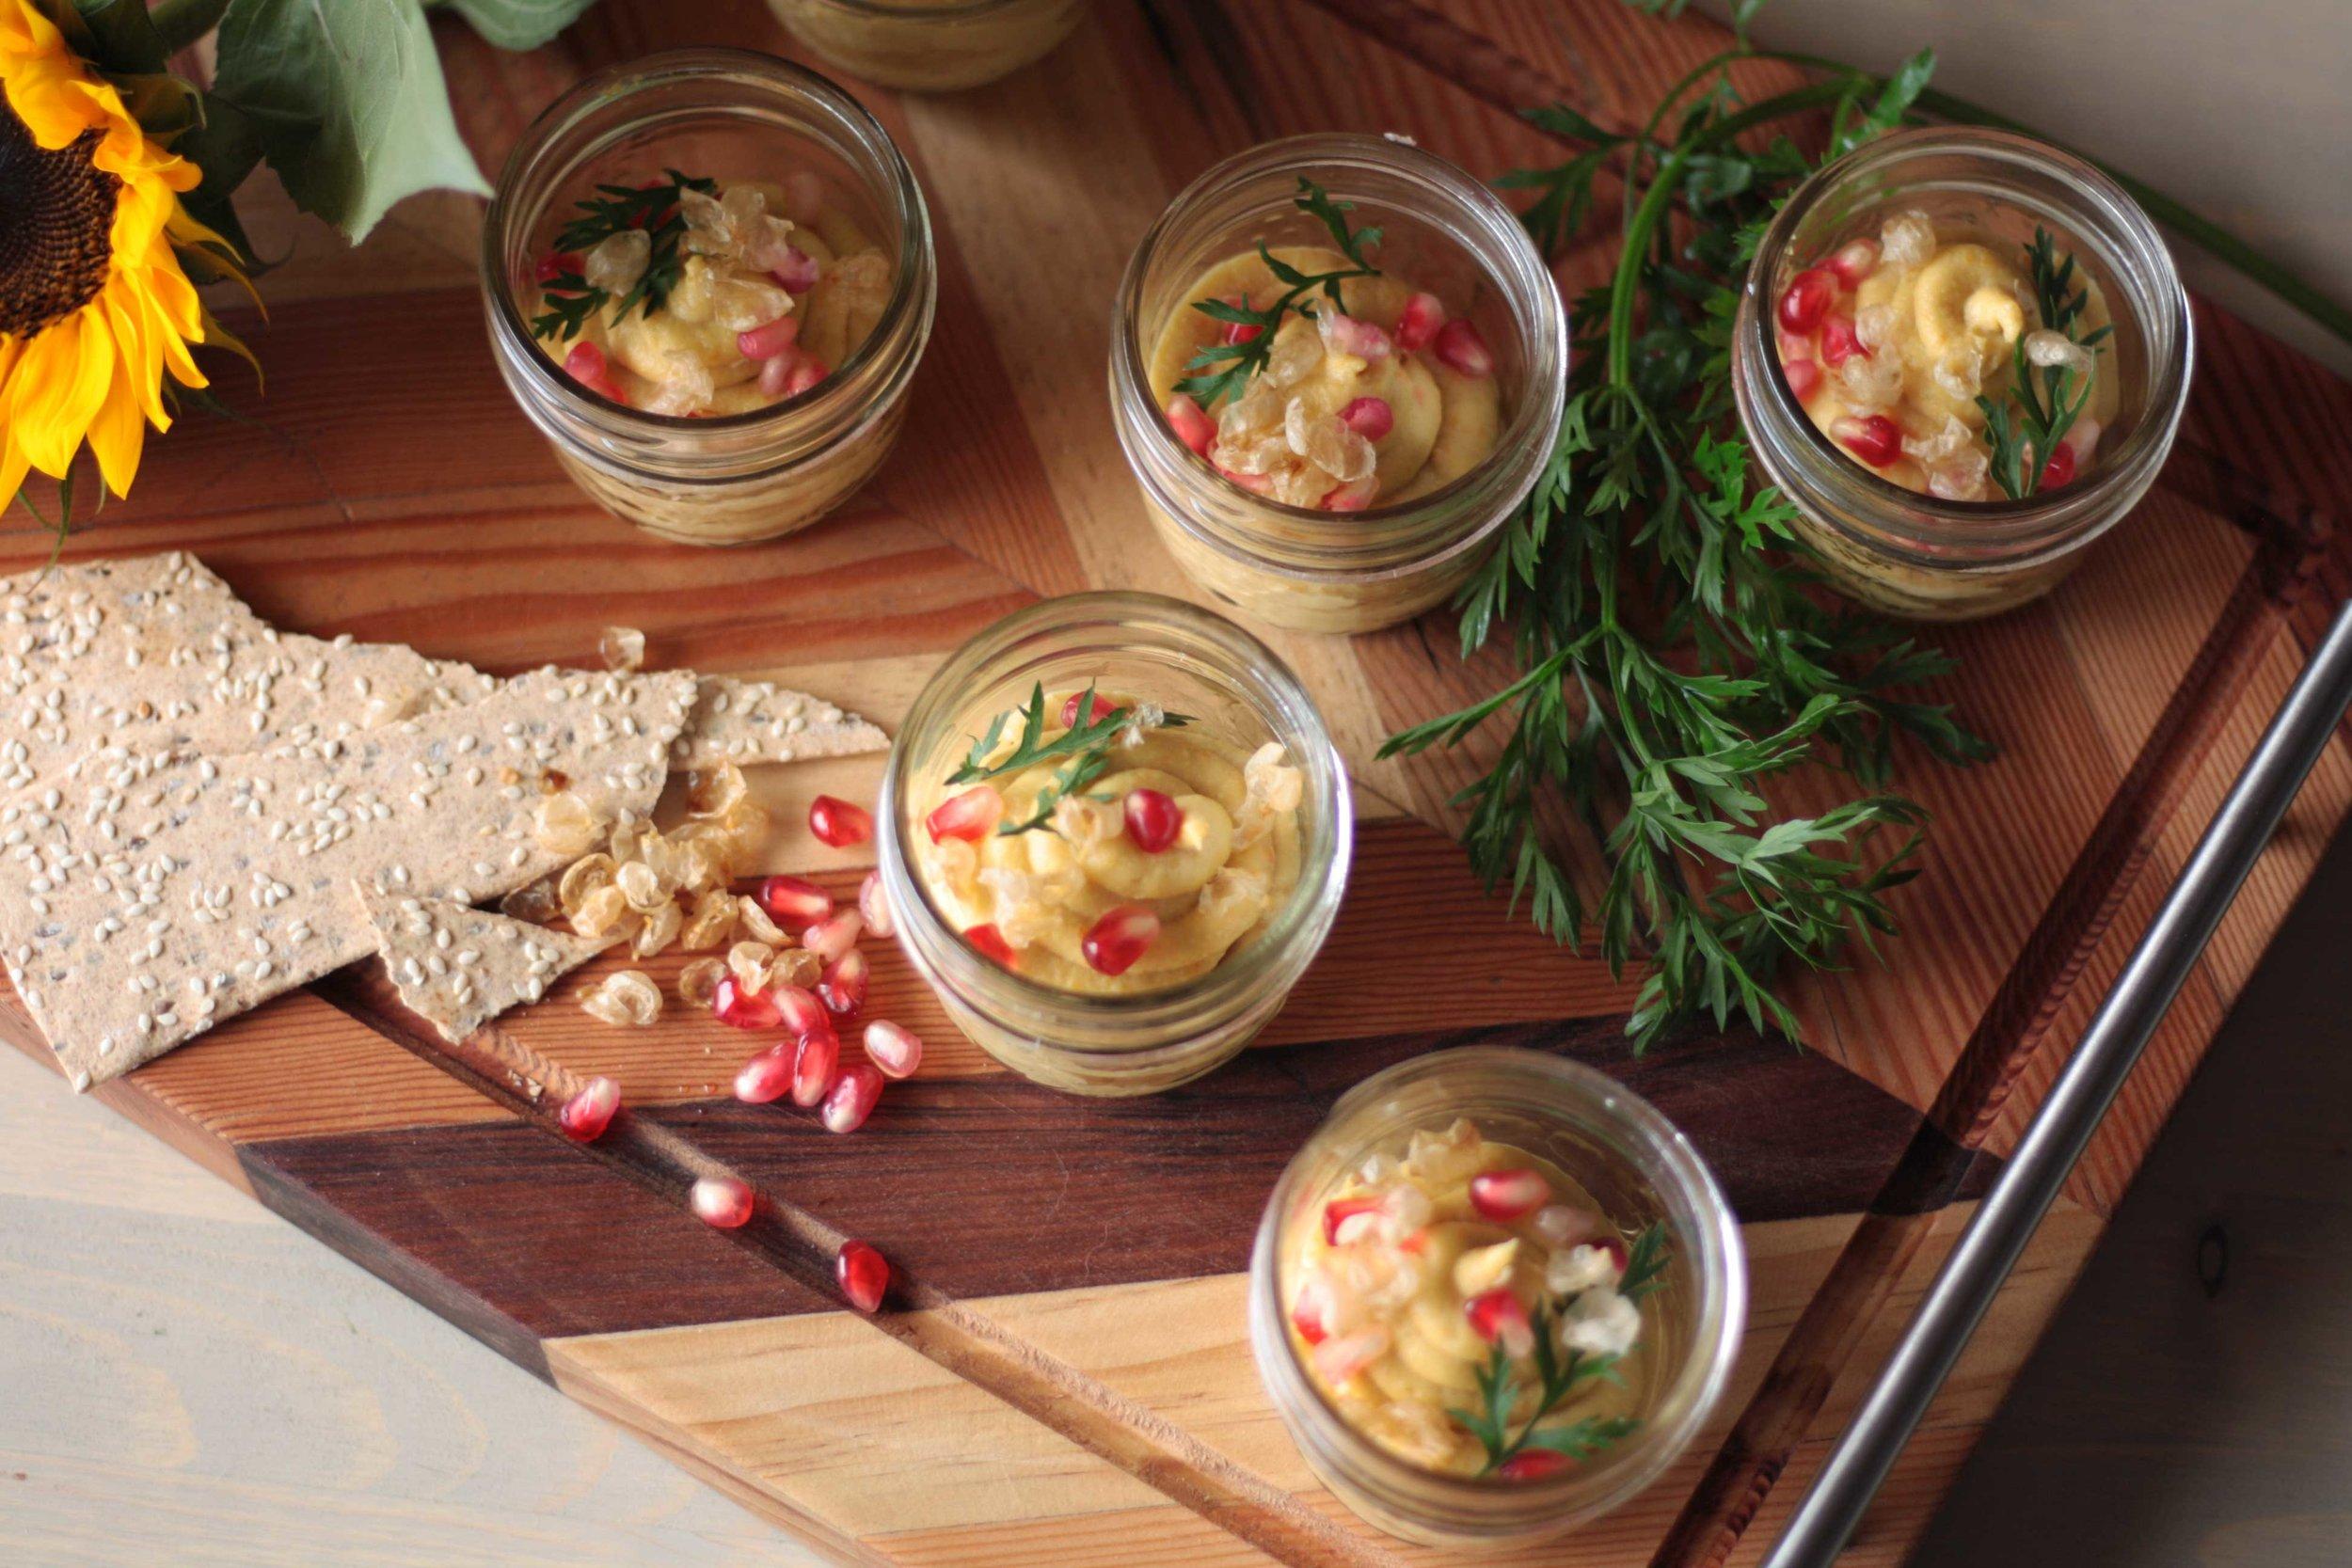 Snack Series: Roasted Carrot Hummus